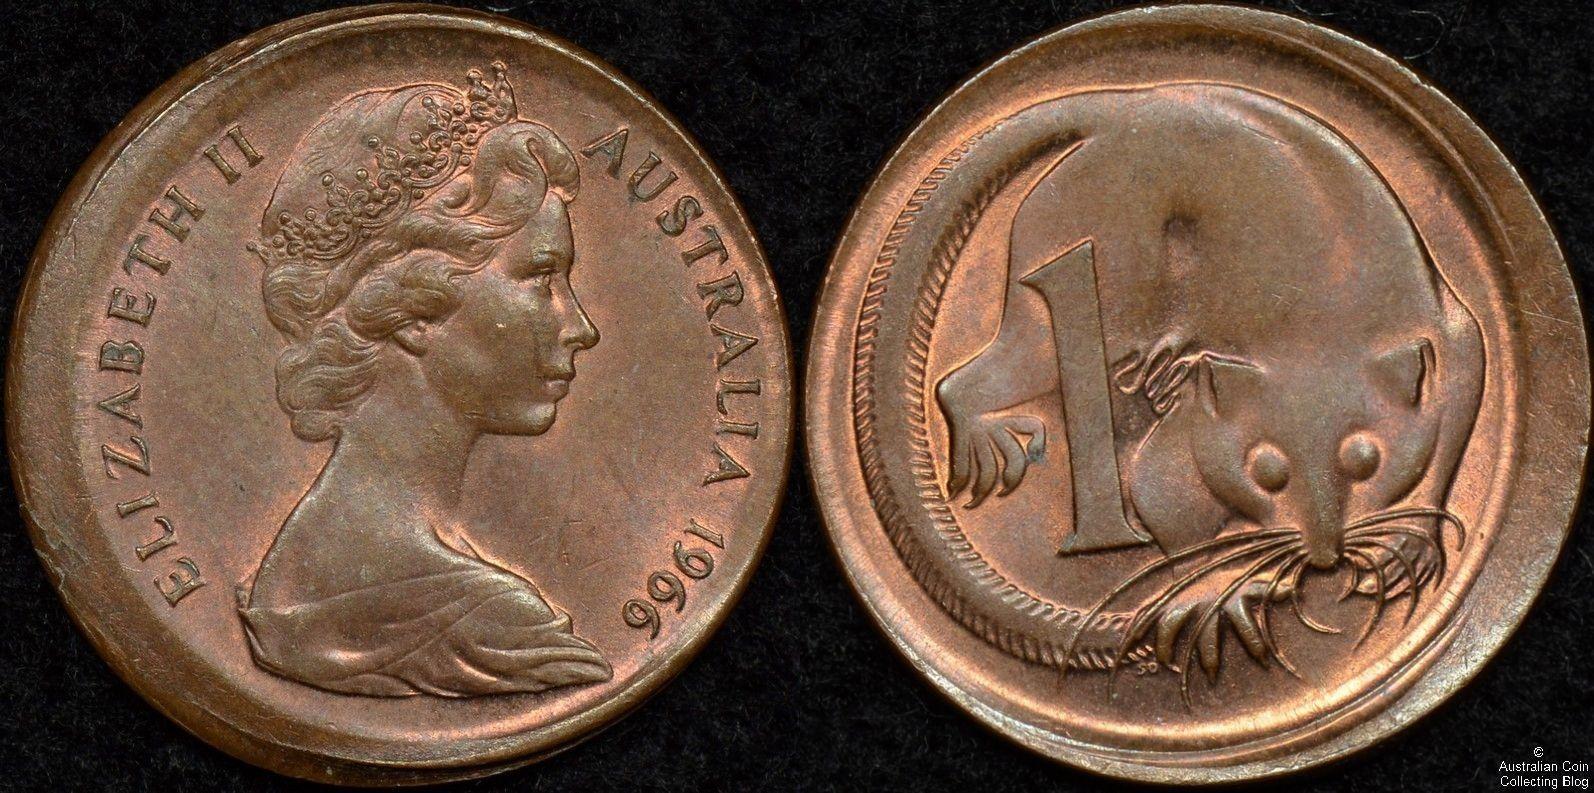 Australia 1966 1 Cent Broadstrike Error Coins Coinerrors